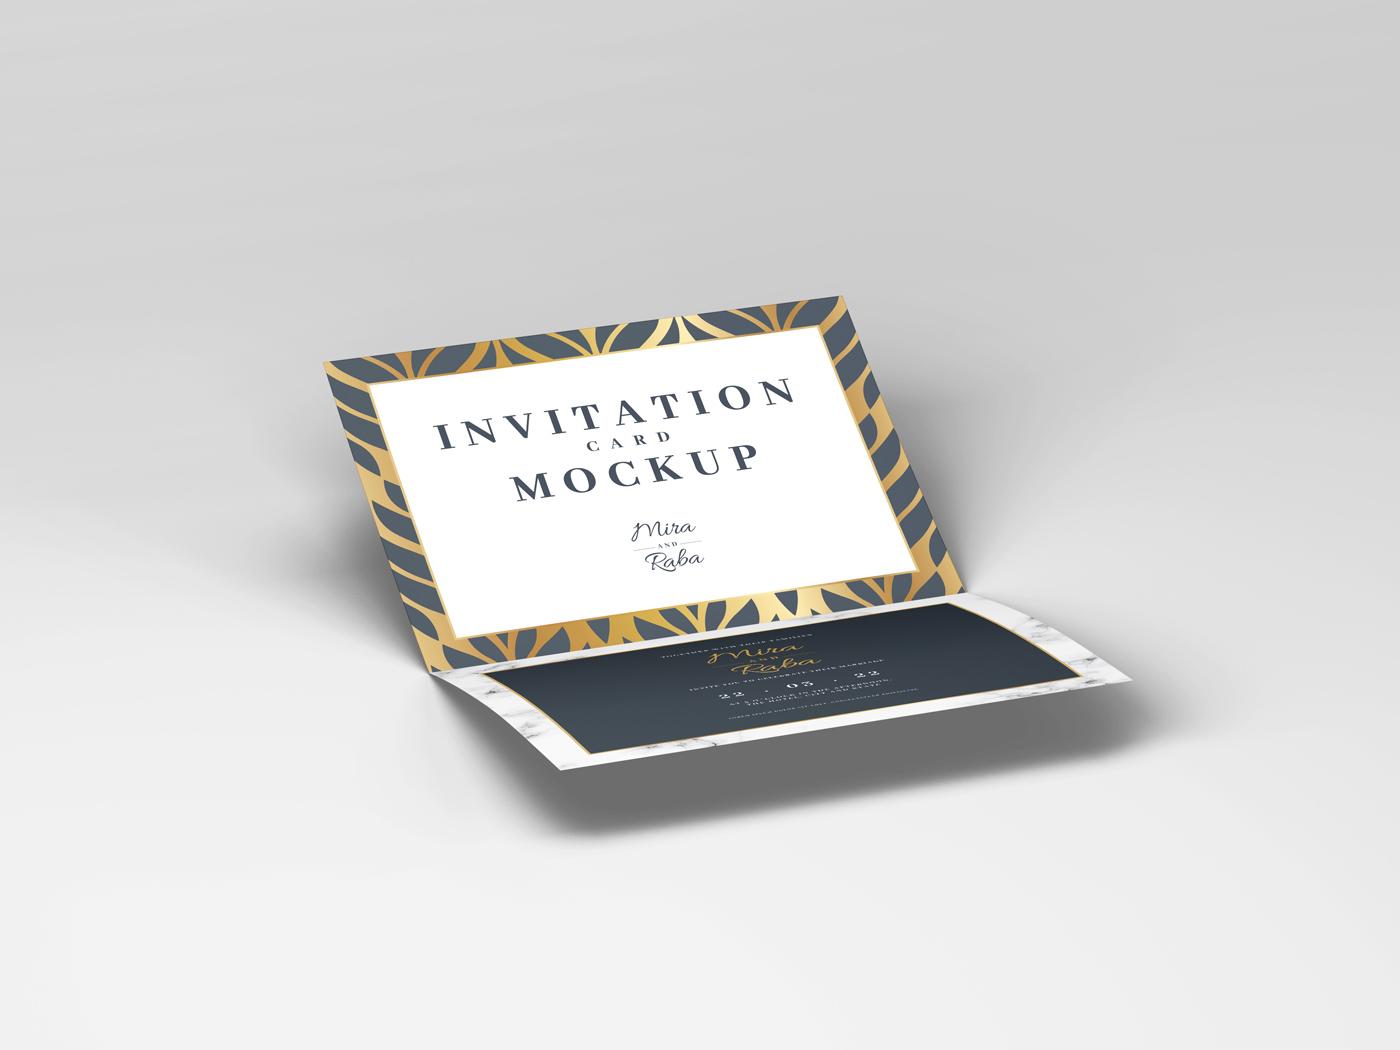 Invitation Card Mockups V1 example image 2